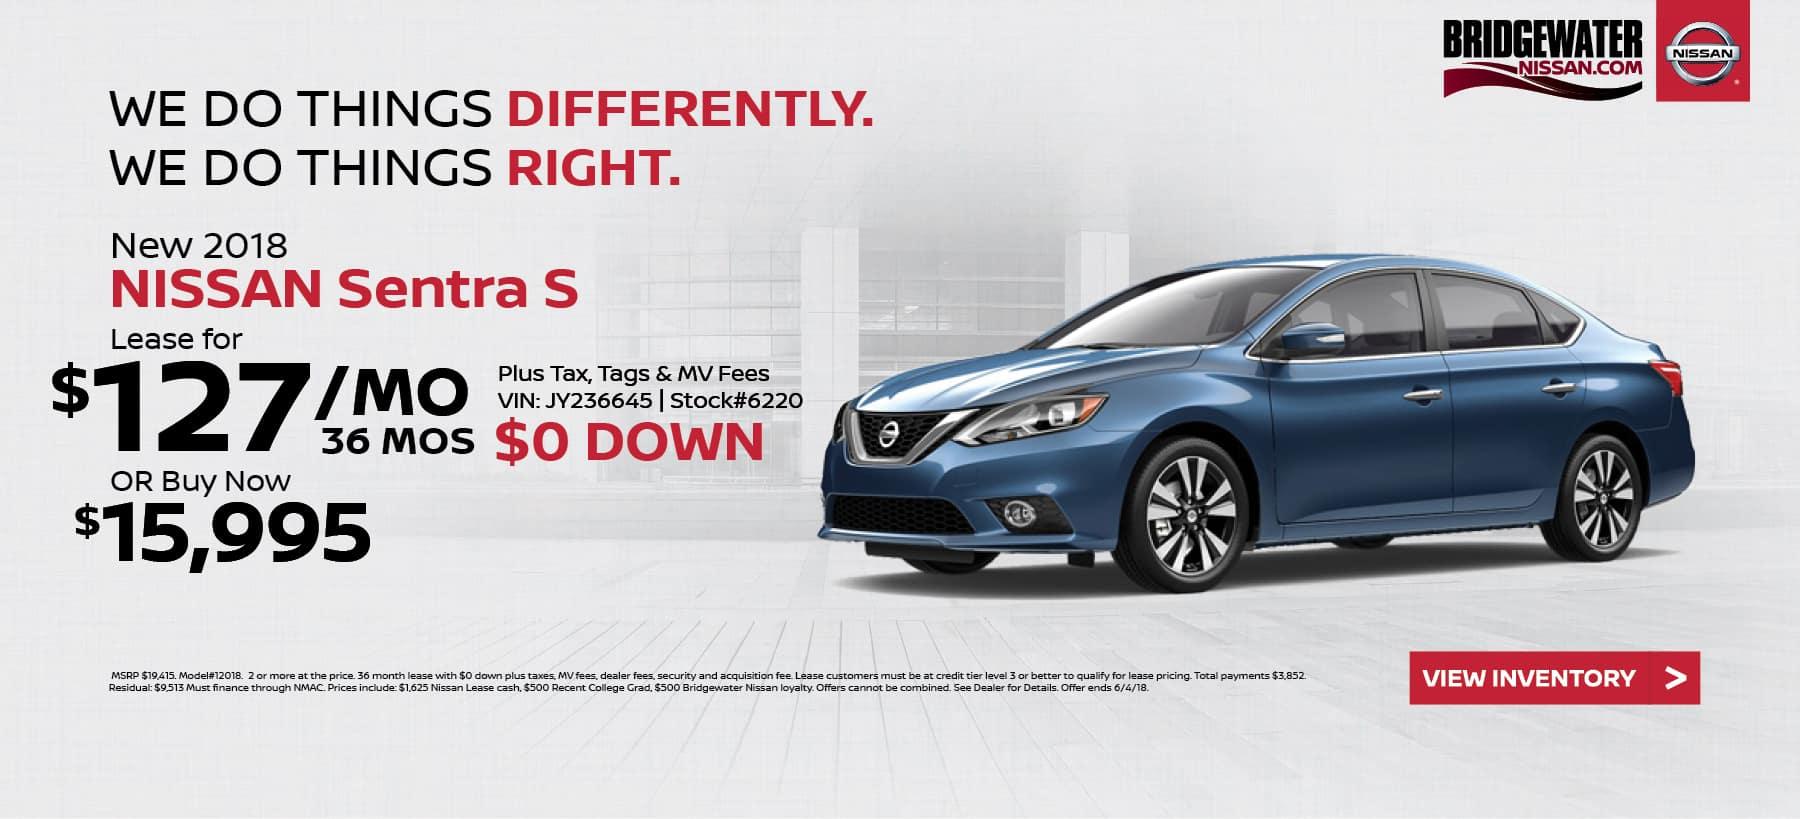 Nissan_Sentra Bridgewater Nissan May Homepage Offer